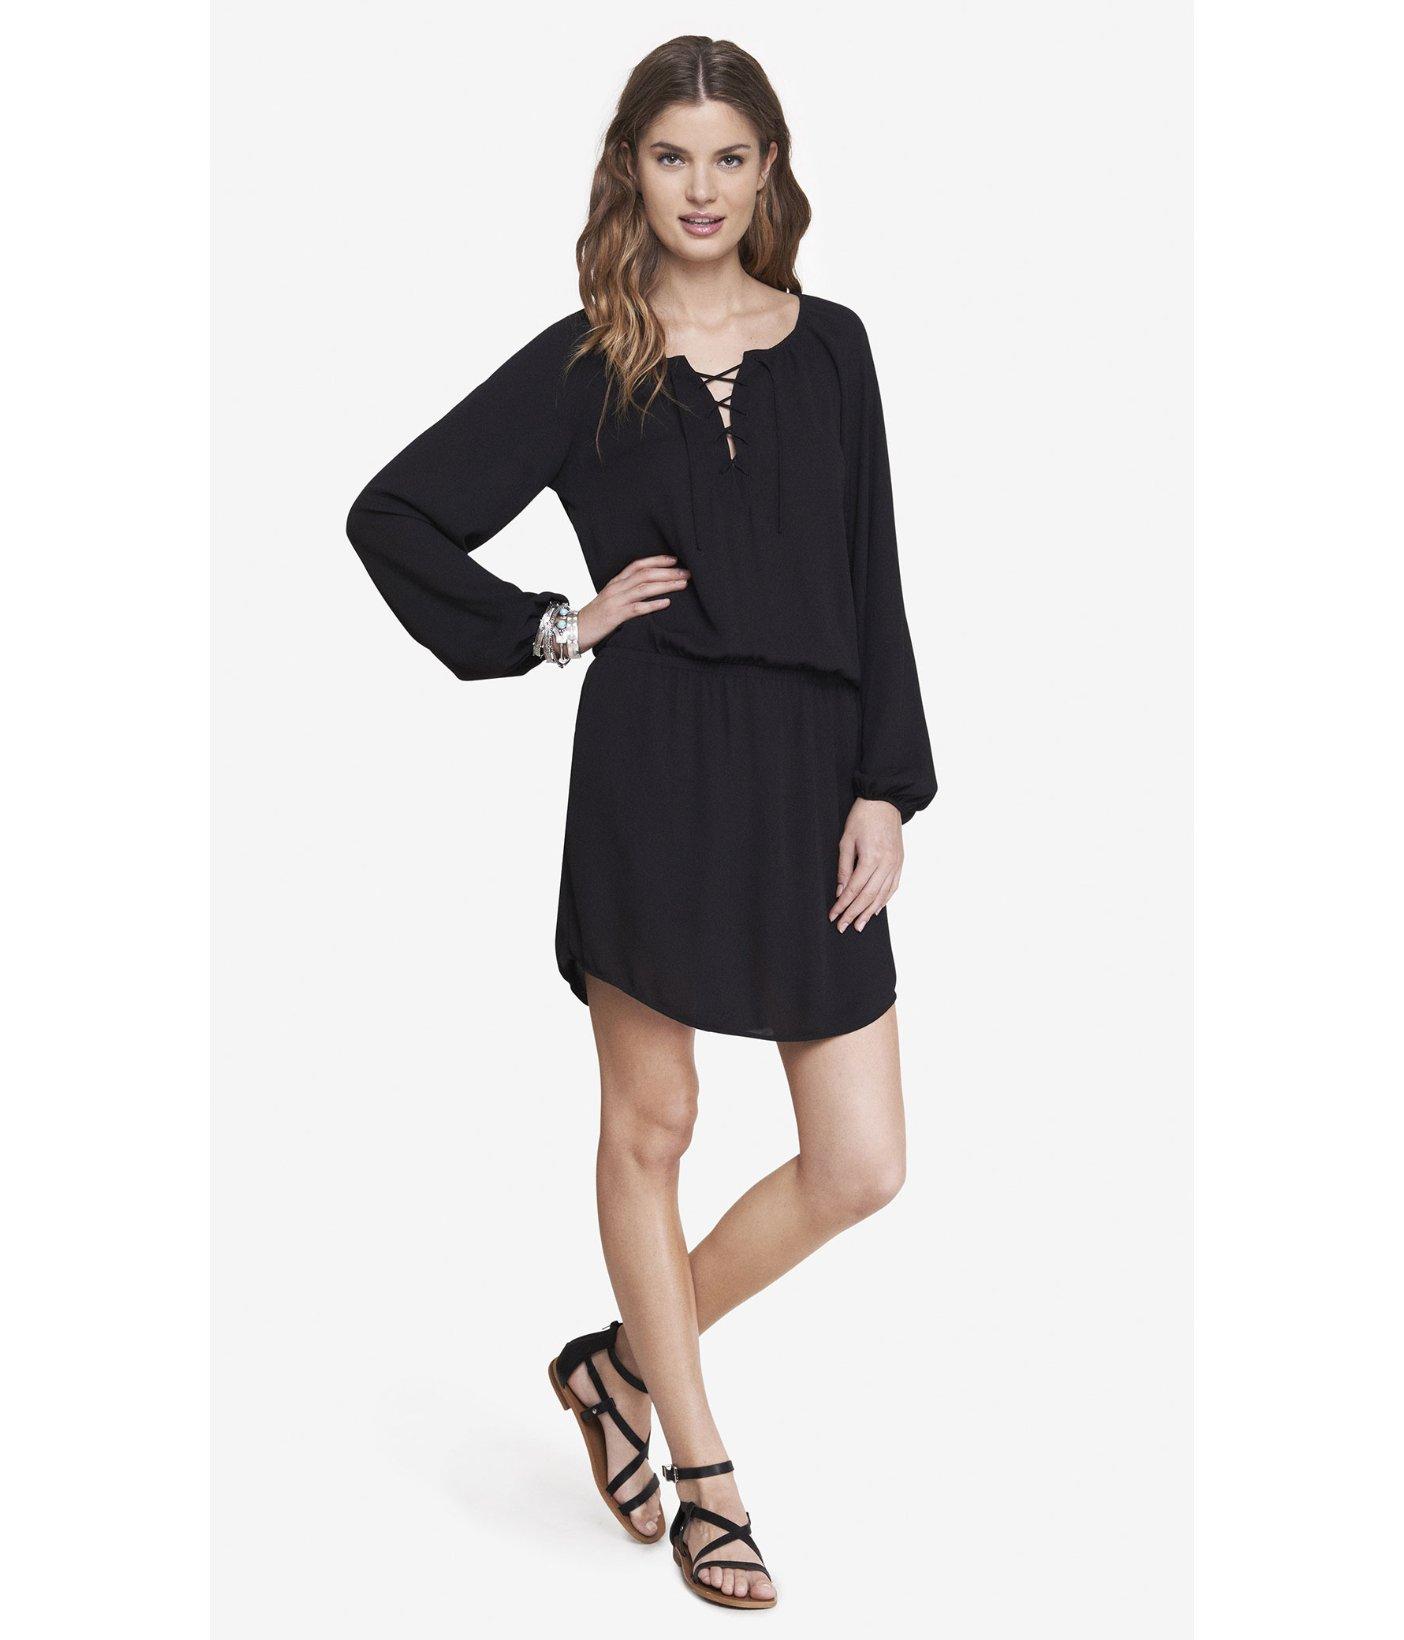 fb0d2c7e753ed Express Black Lace Dress Long Sleeve - raveitsafe